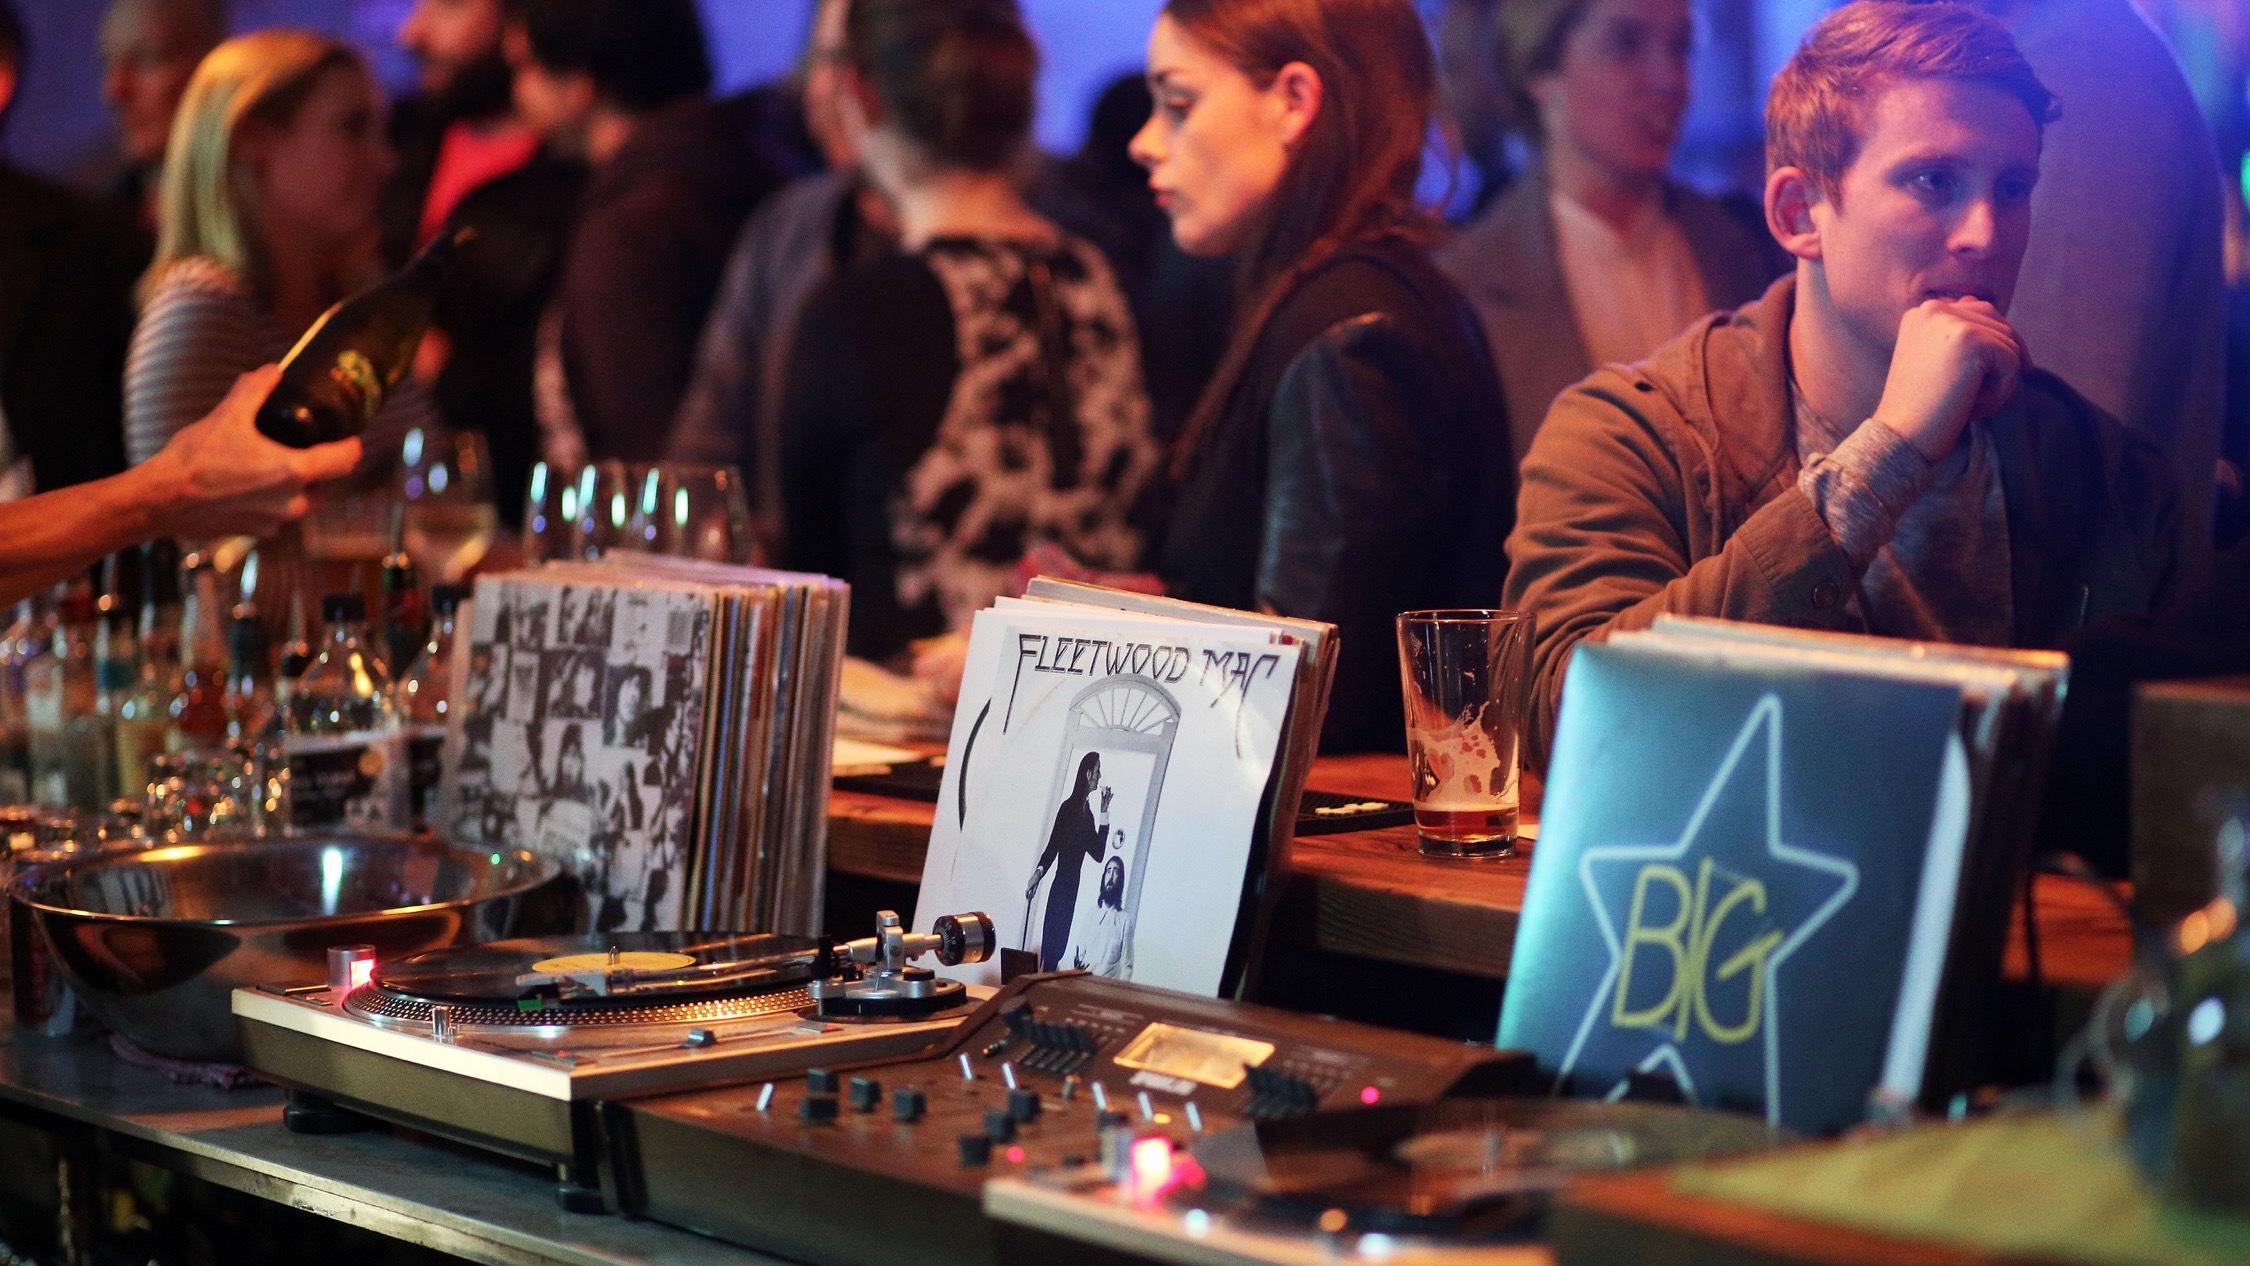 Record Vinyls at Lulie St Tavern